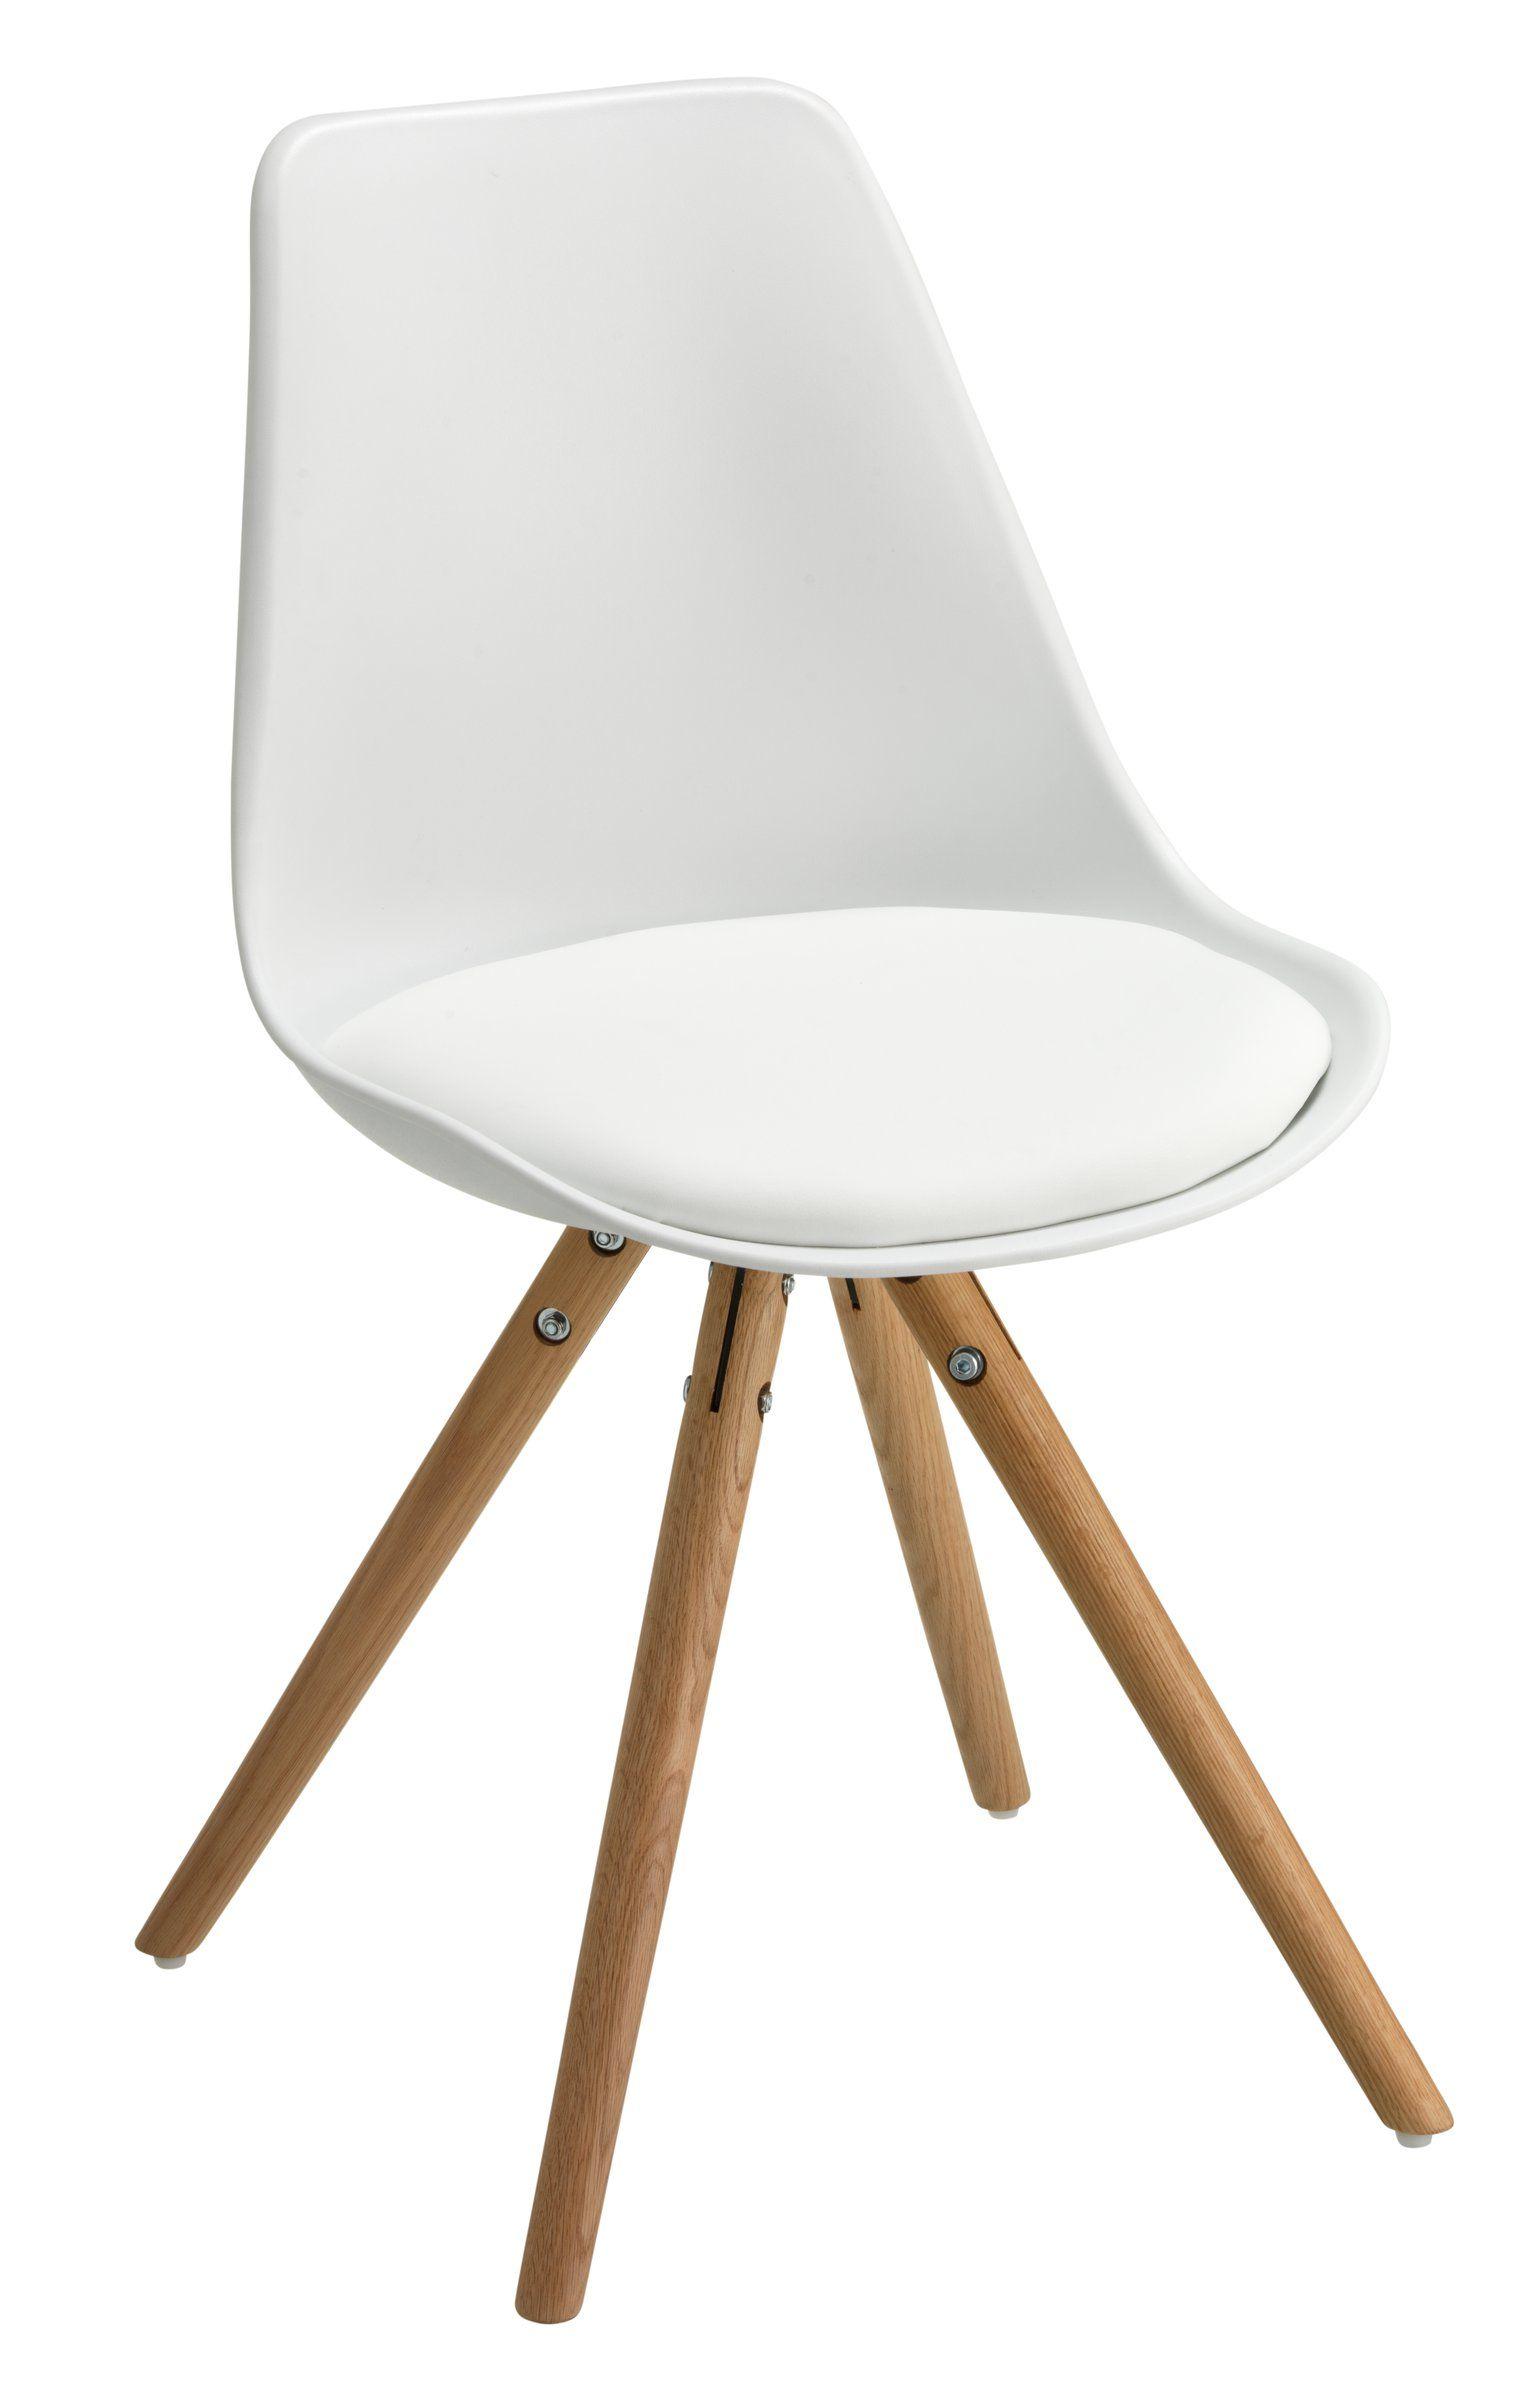 Stuhl TOTTI, Eiche massiv,geölt,Kunststoffschale gepolstert,Kunstleder